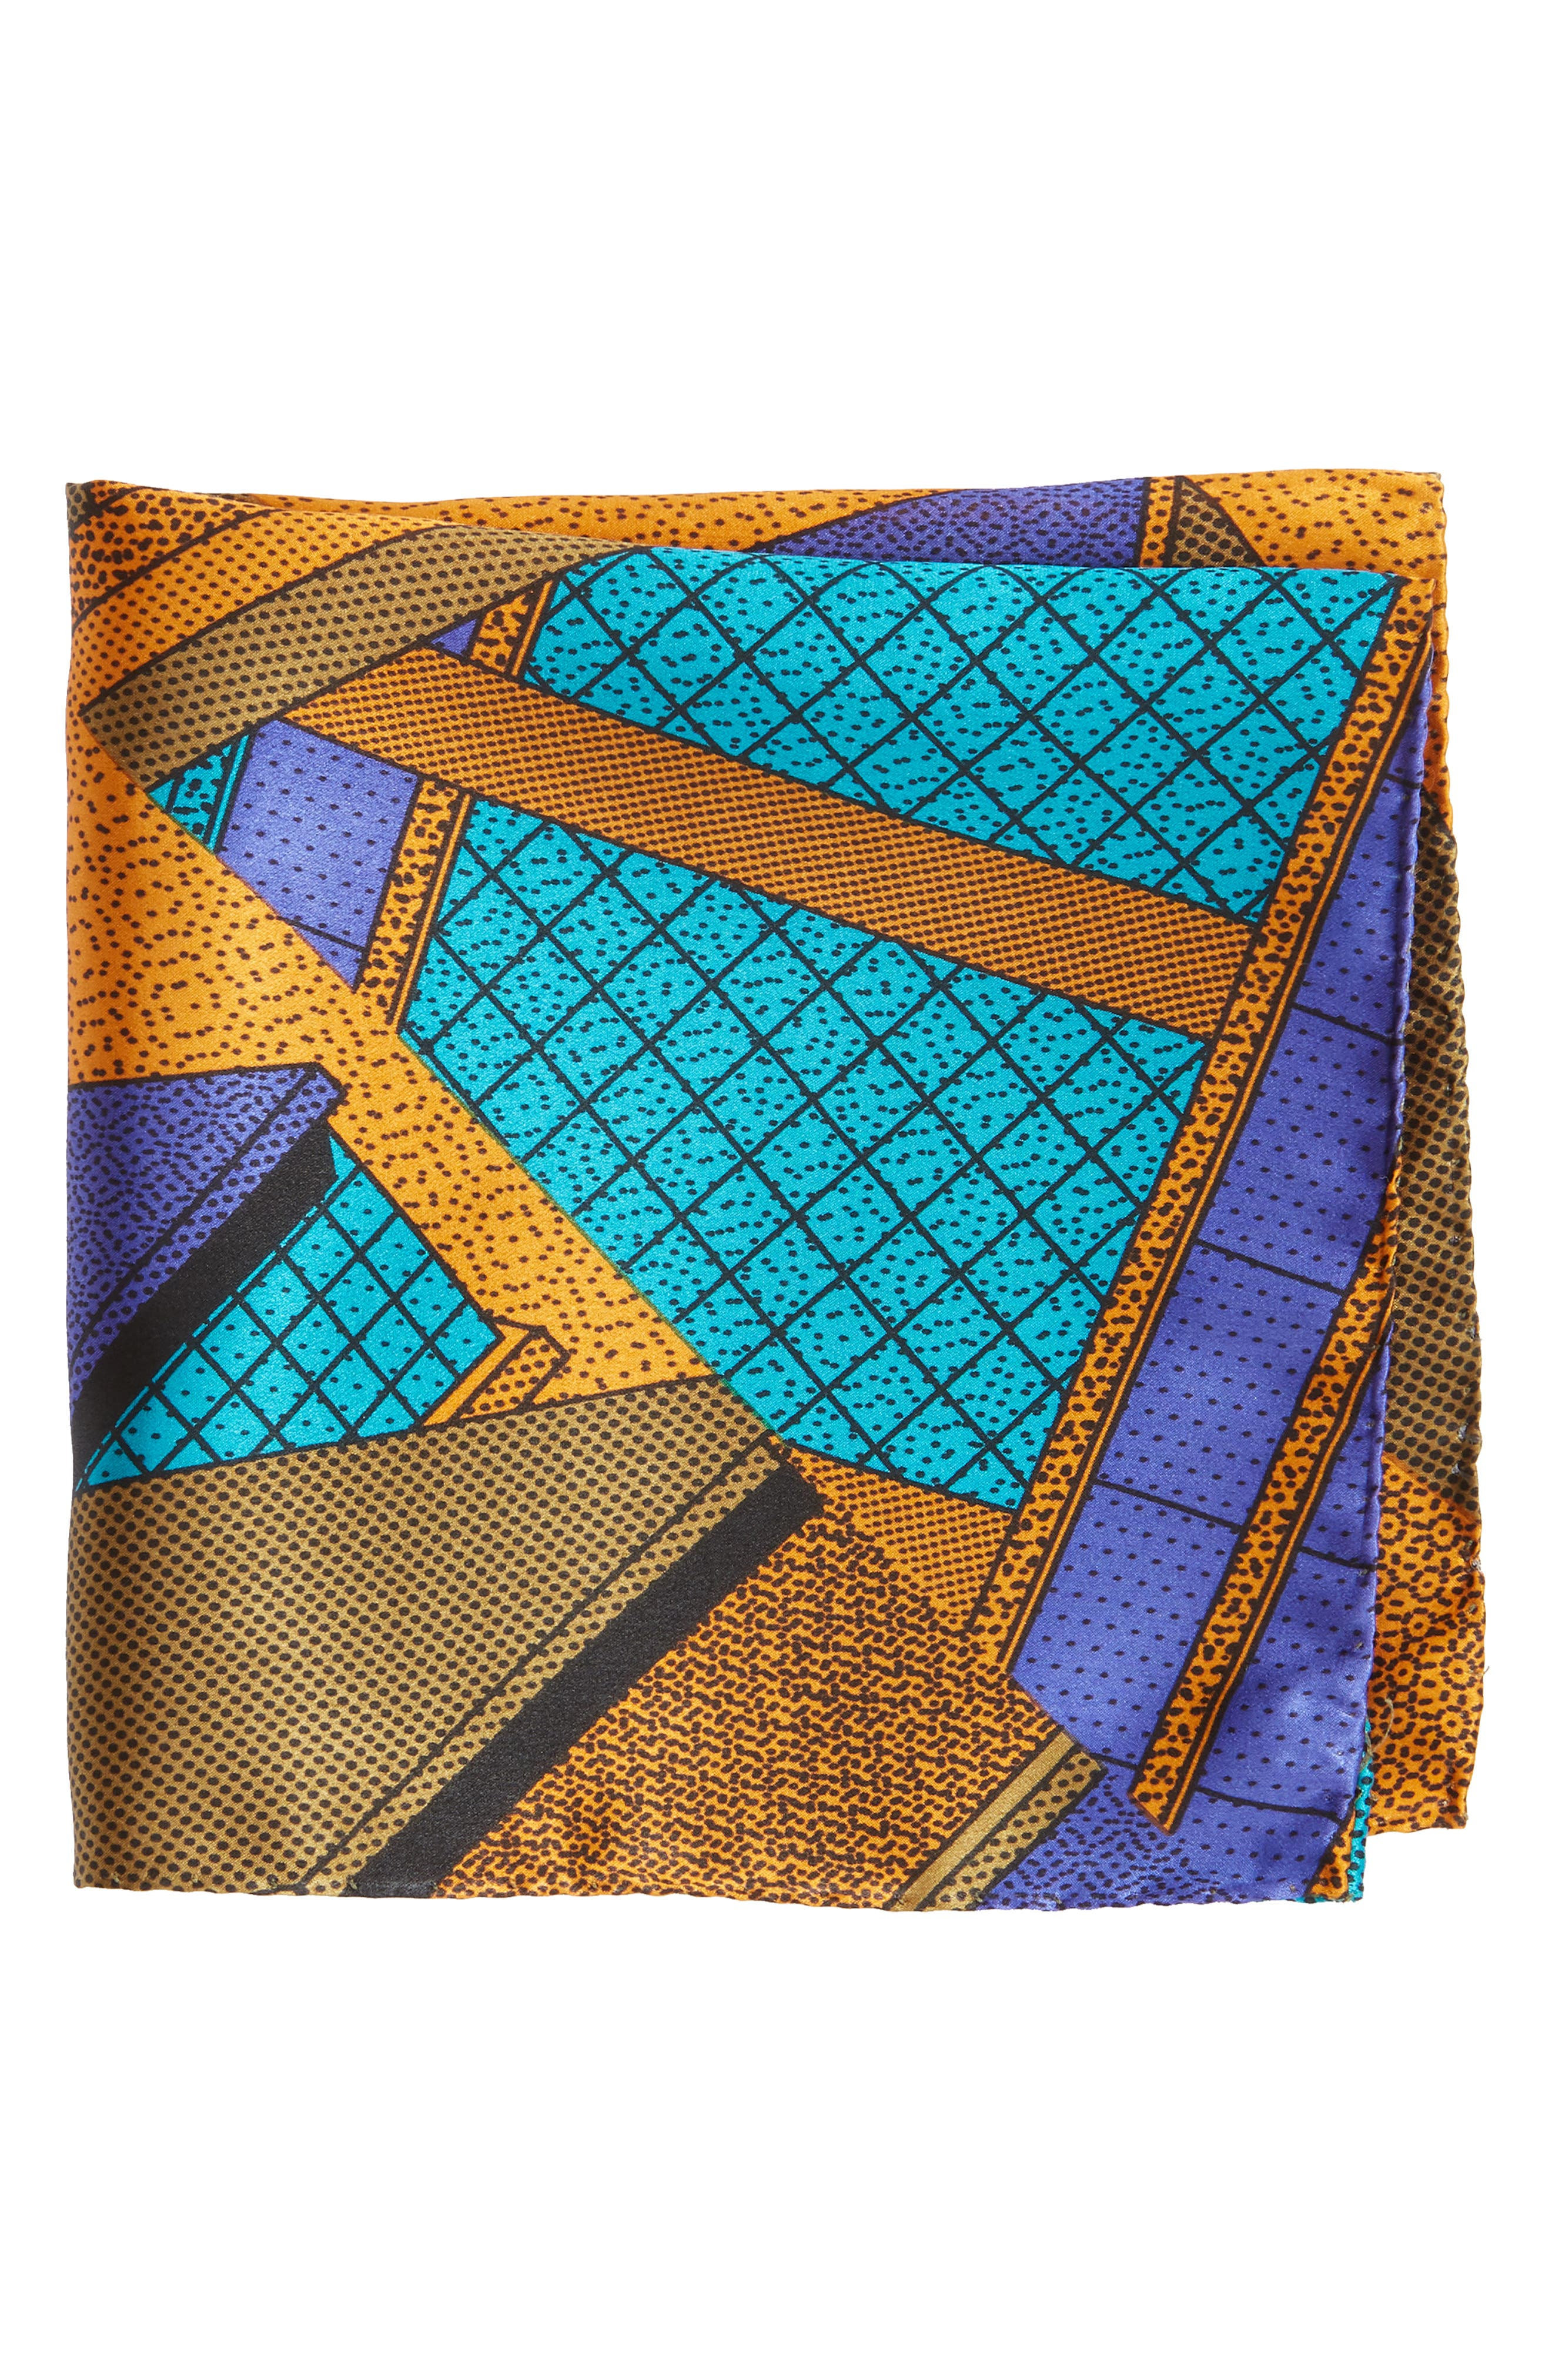 MEMPHIS Milano Pochette Silk Pocket Square,                         Main,                         color, TEAL/ ORANGE